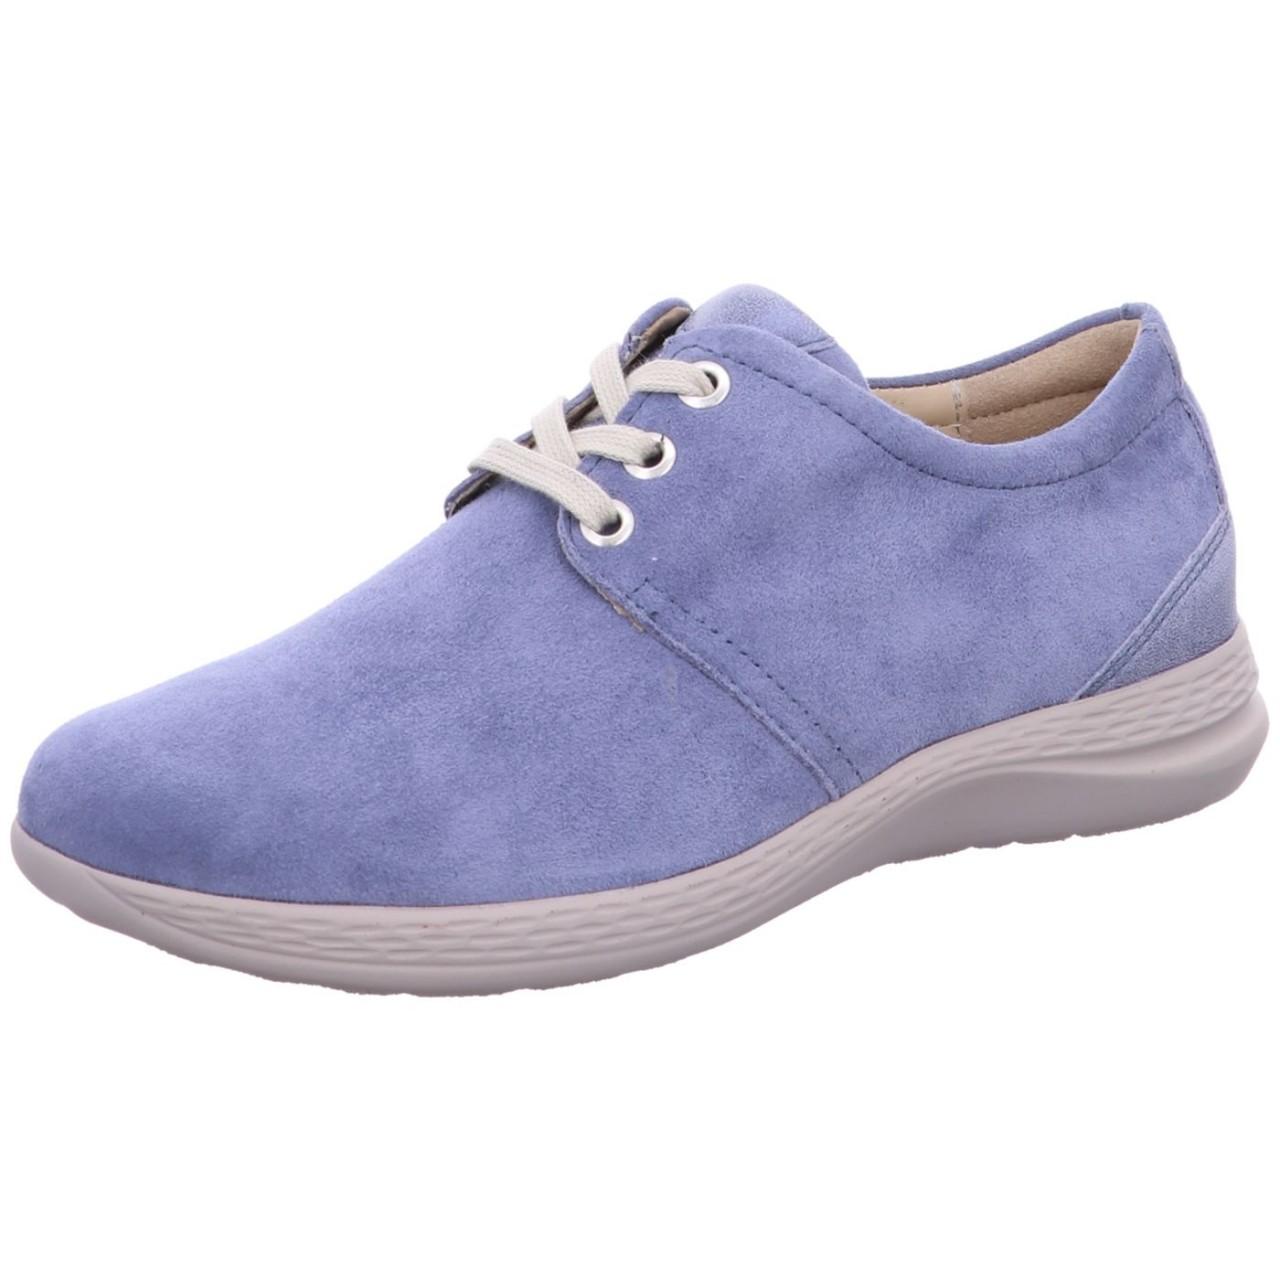 Fidelio Schnürschuh Hi-Energy Blau jeans 52 6101 89